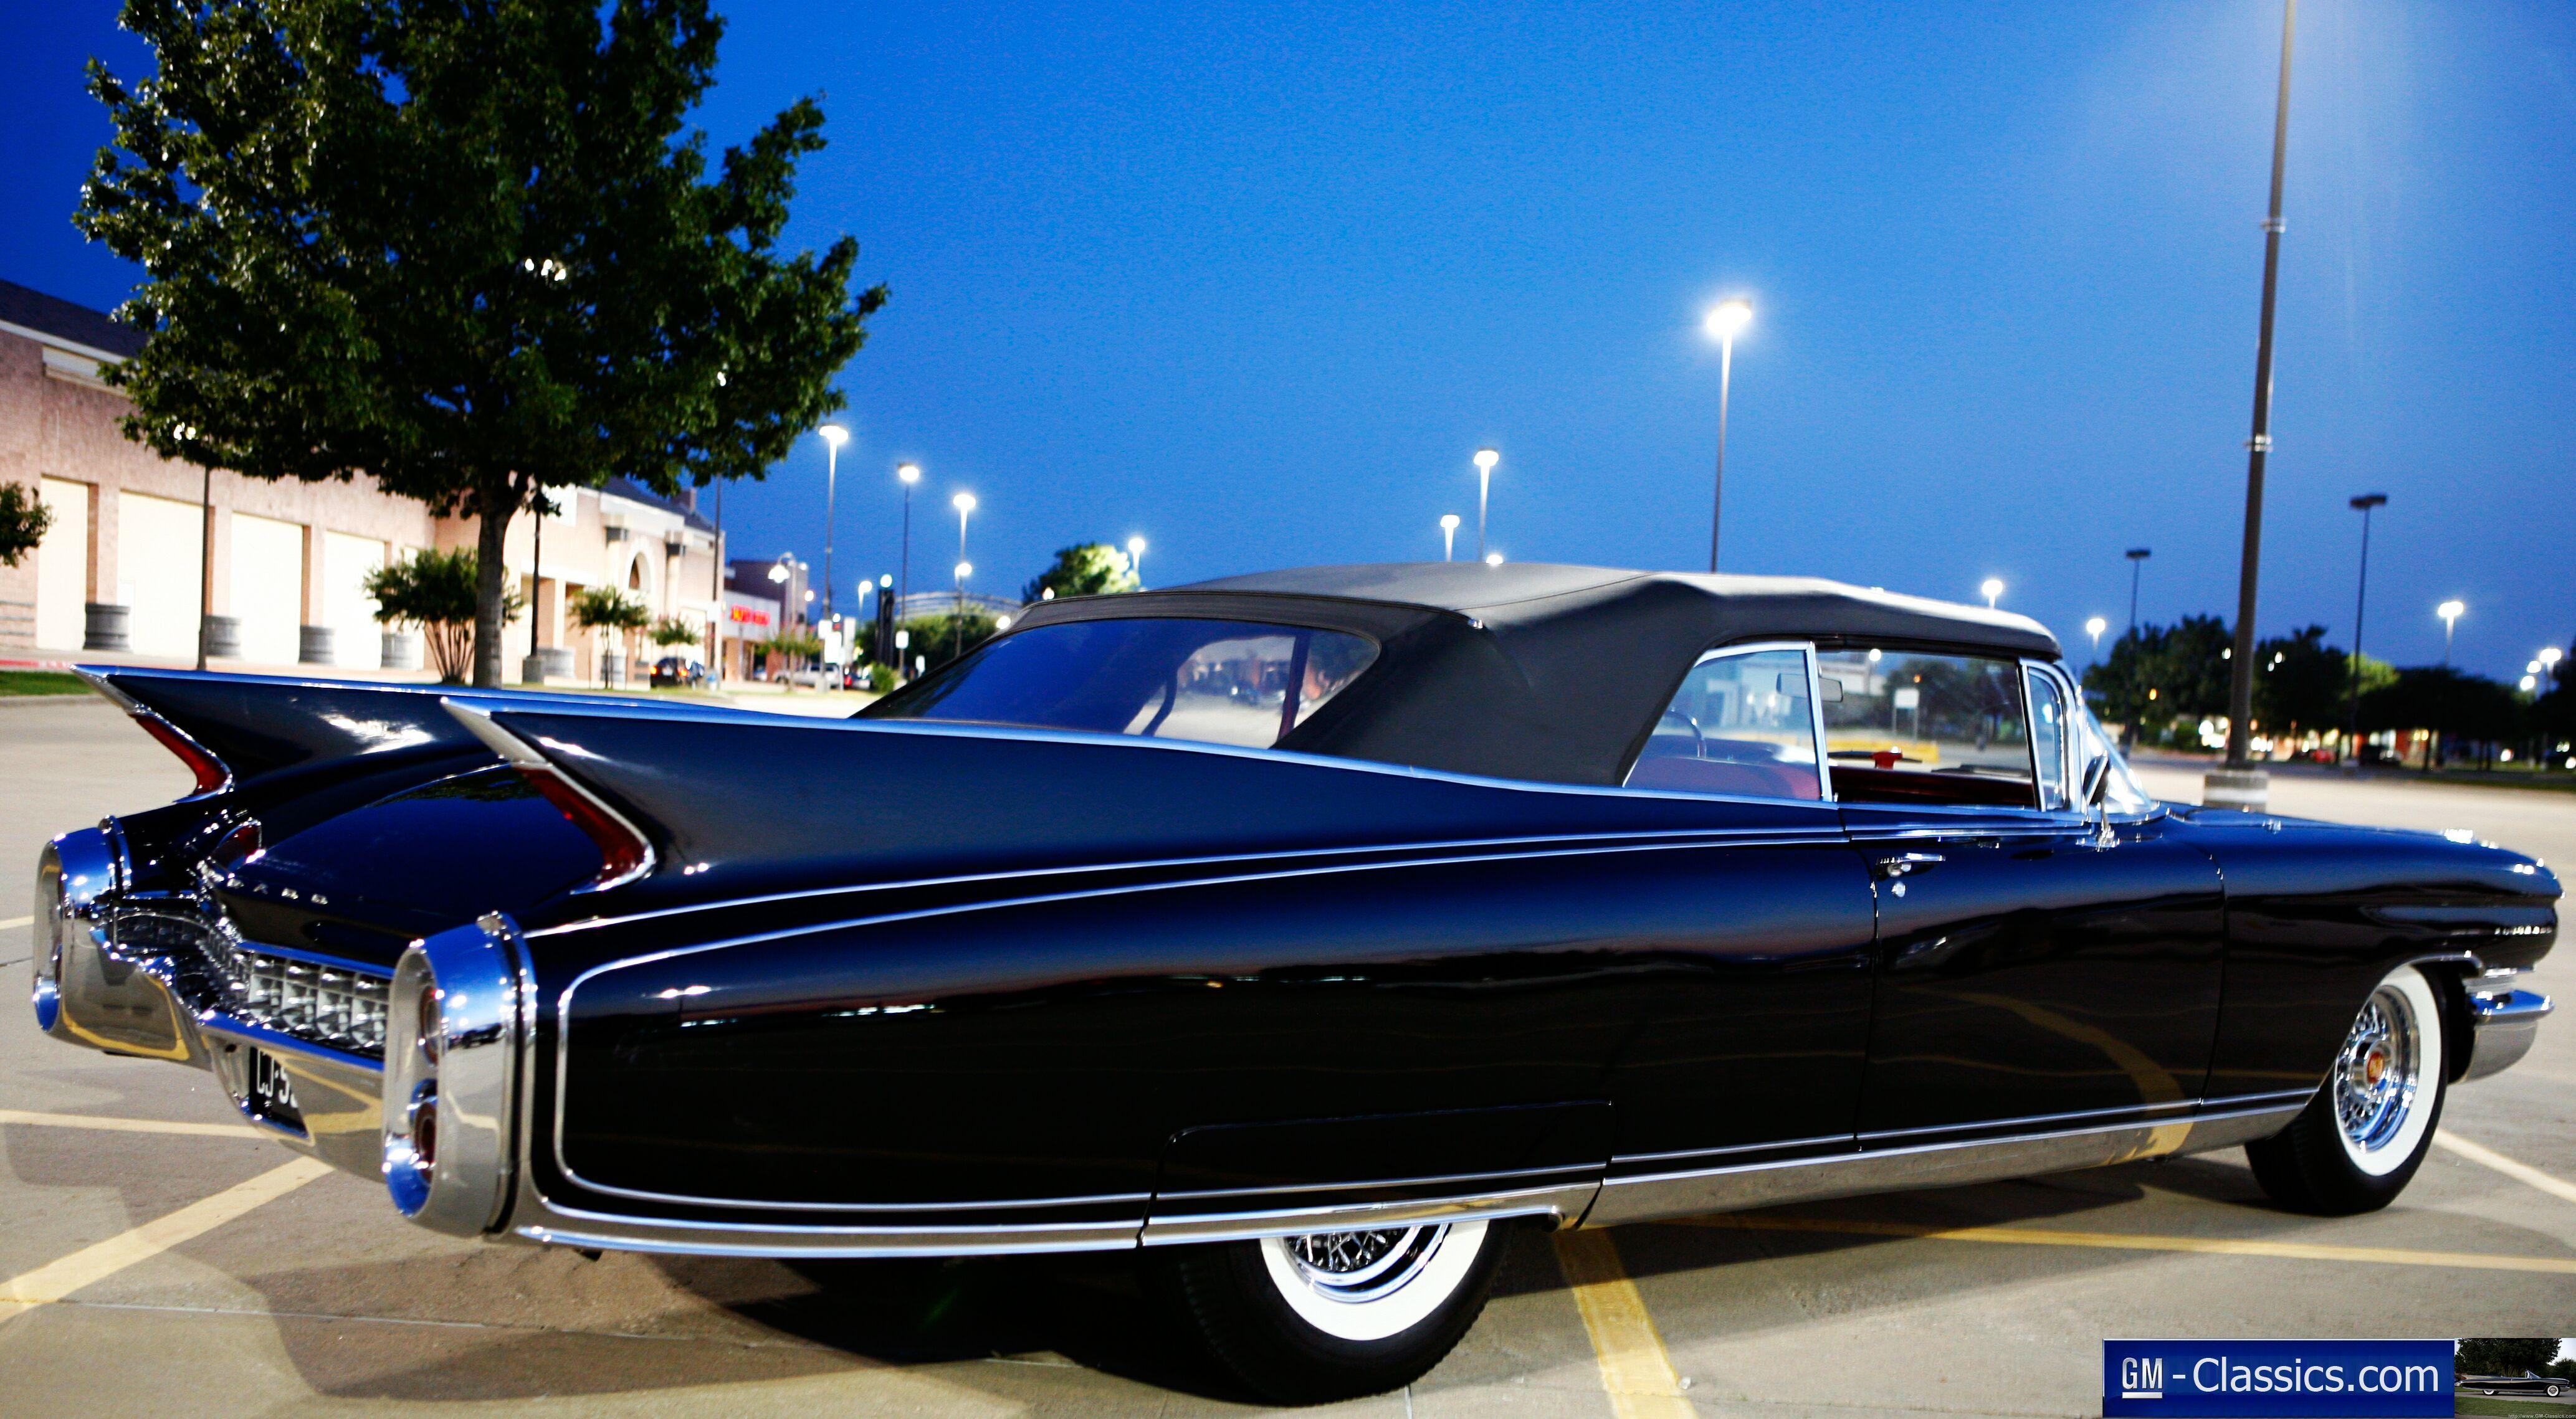 1960 Cadillac Eldorado Biarritz | custom cars | Pinterest | Cadillac